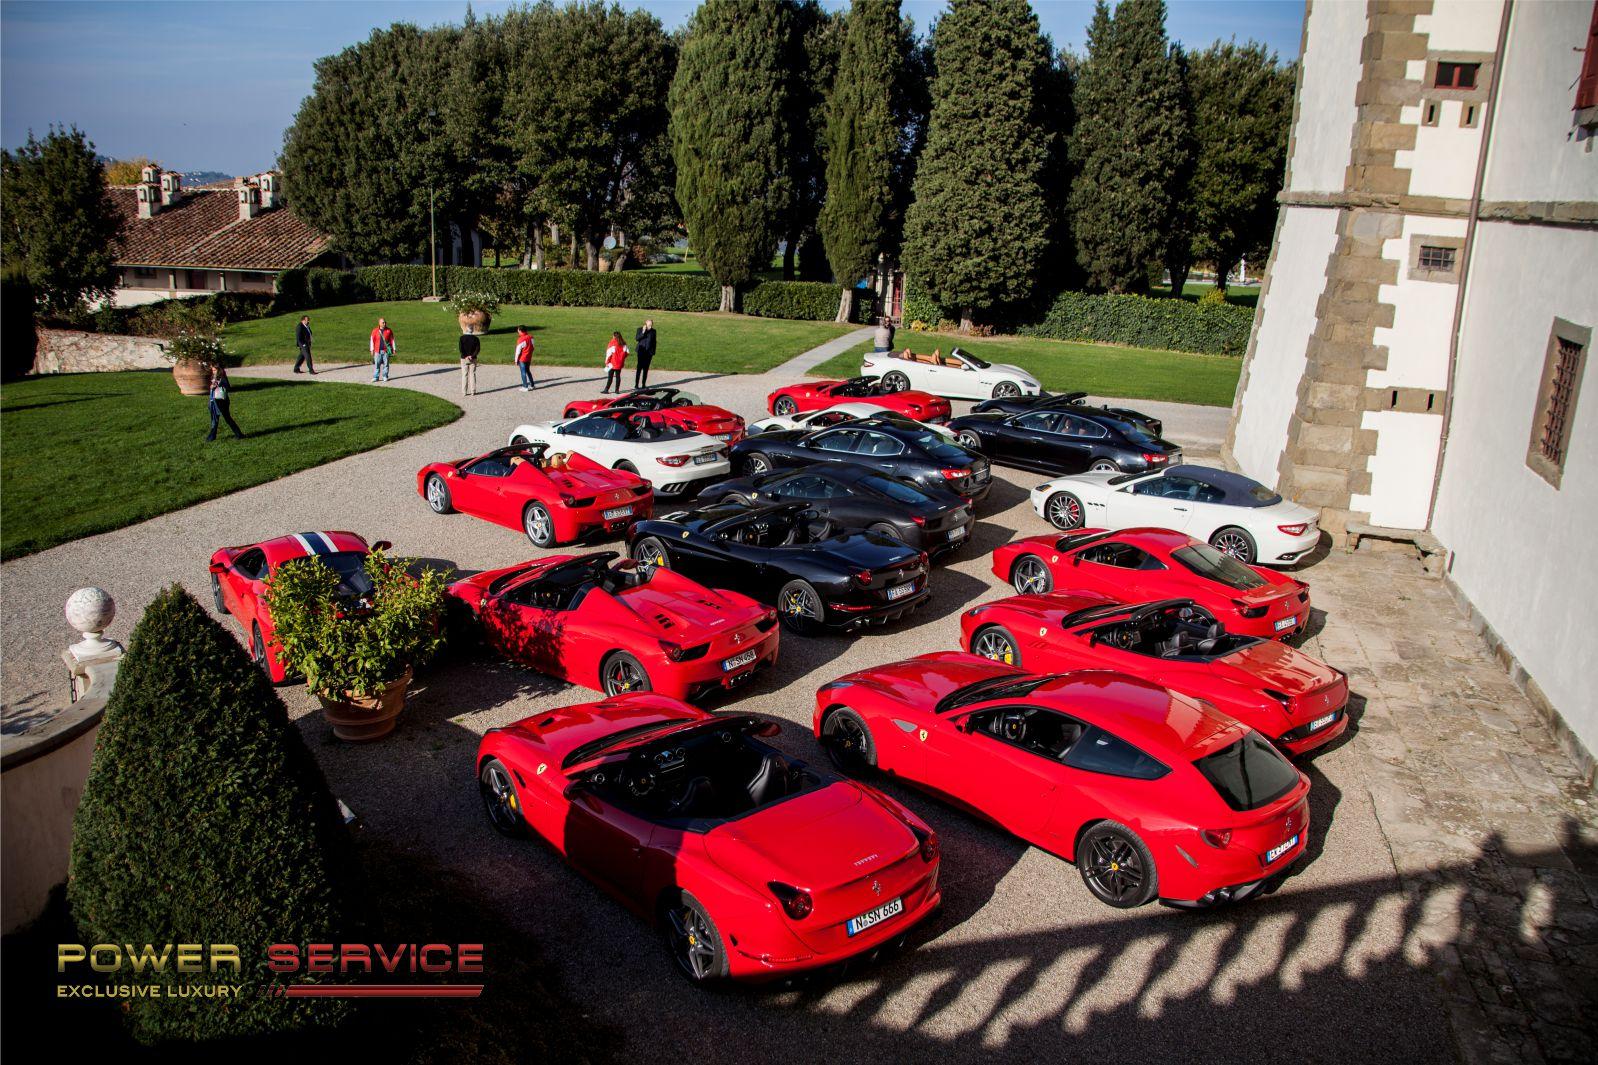 Rent a Ferrari California Turbo to explore Chianti hills - Power Service Luxury car hire